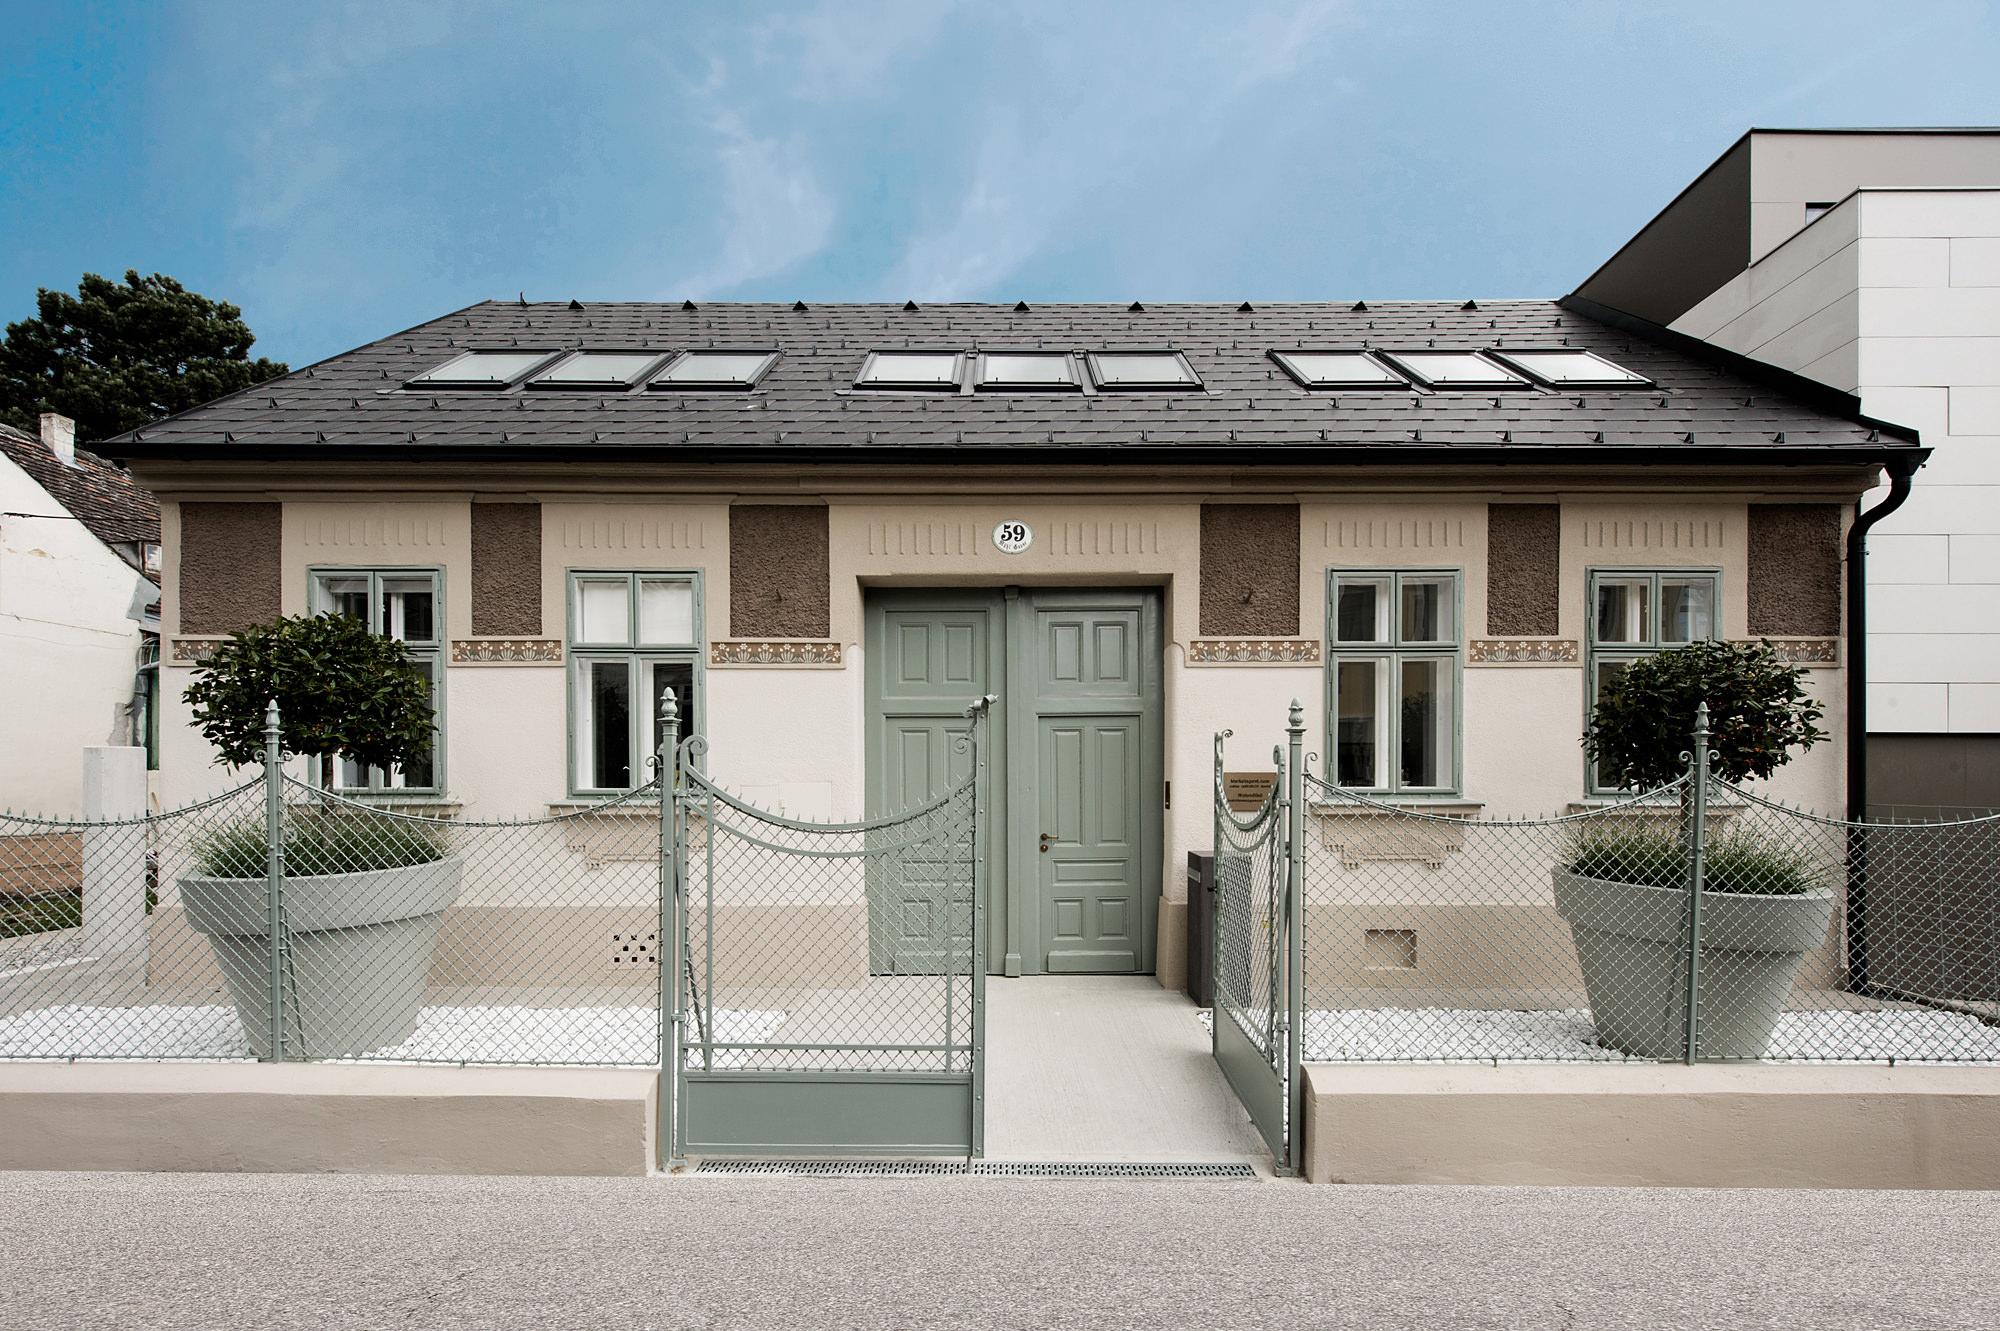 marketagent_com_11_umbau_buerogebaeude_baden_bei_wien_junger_beer_architektur